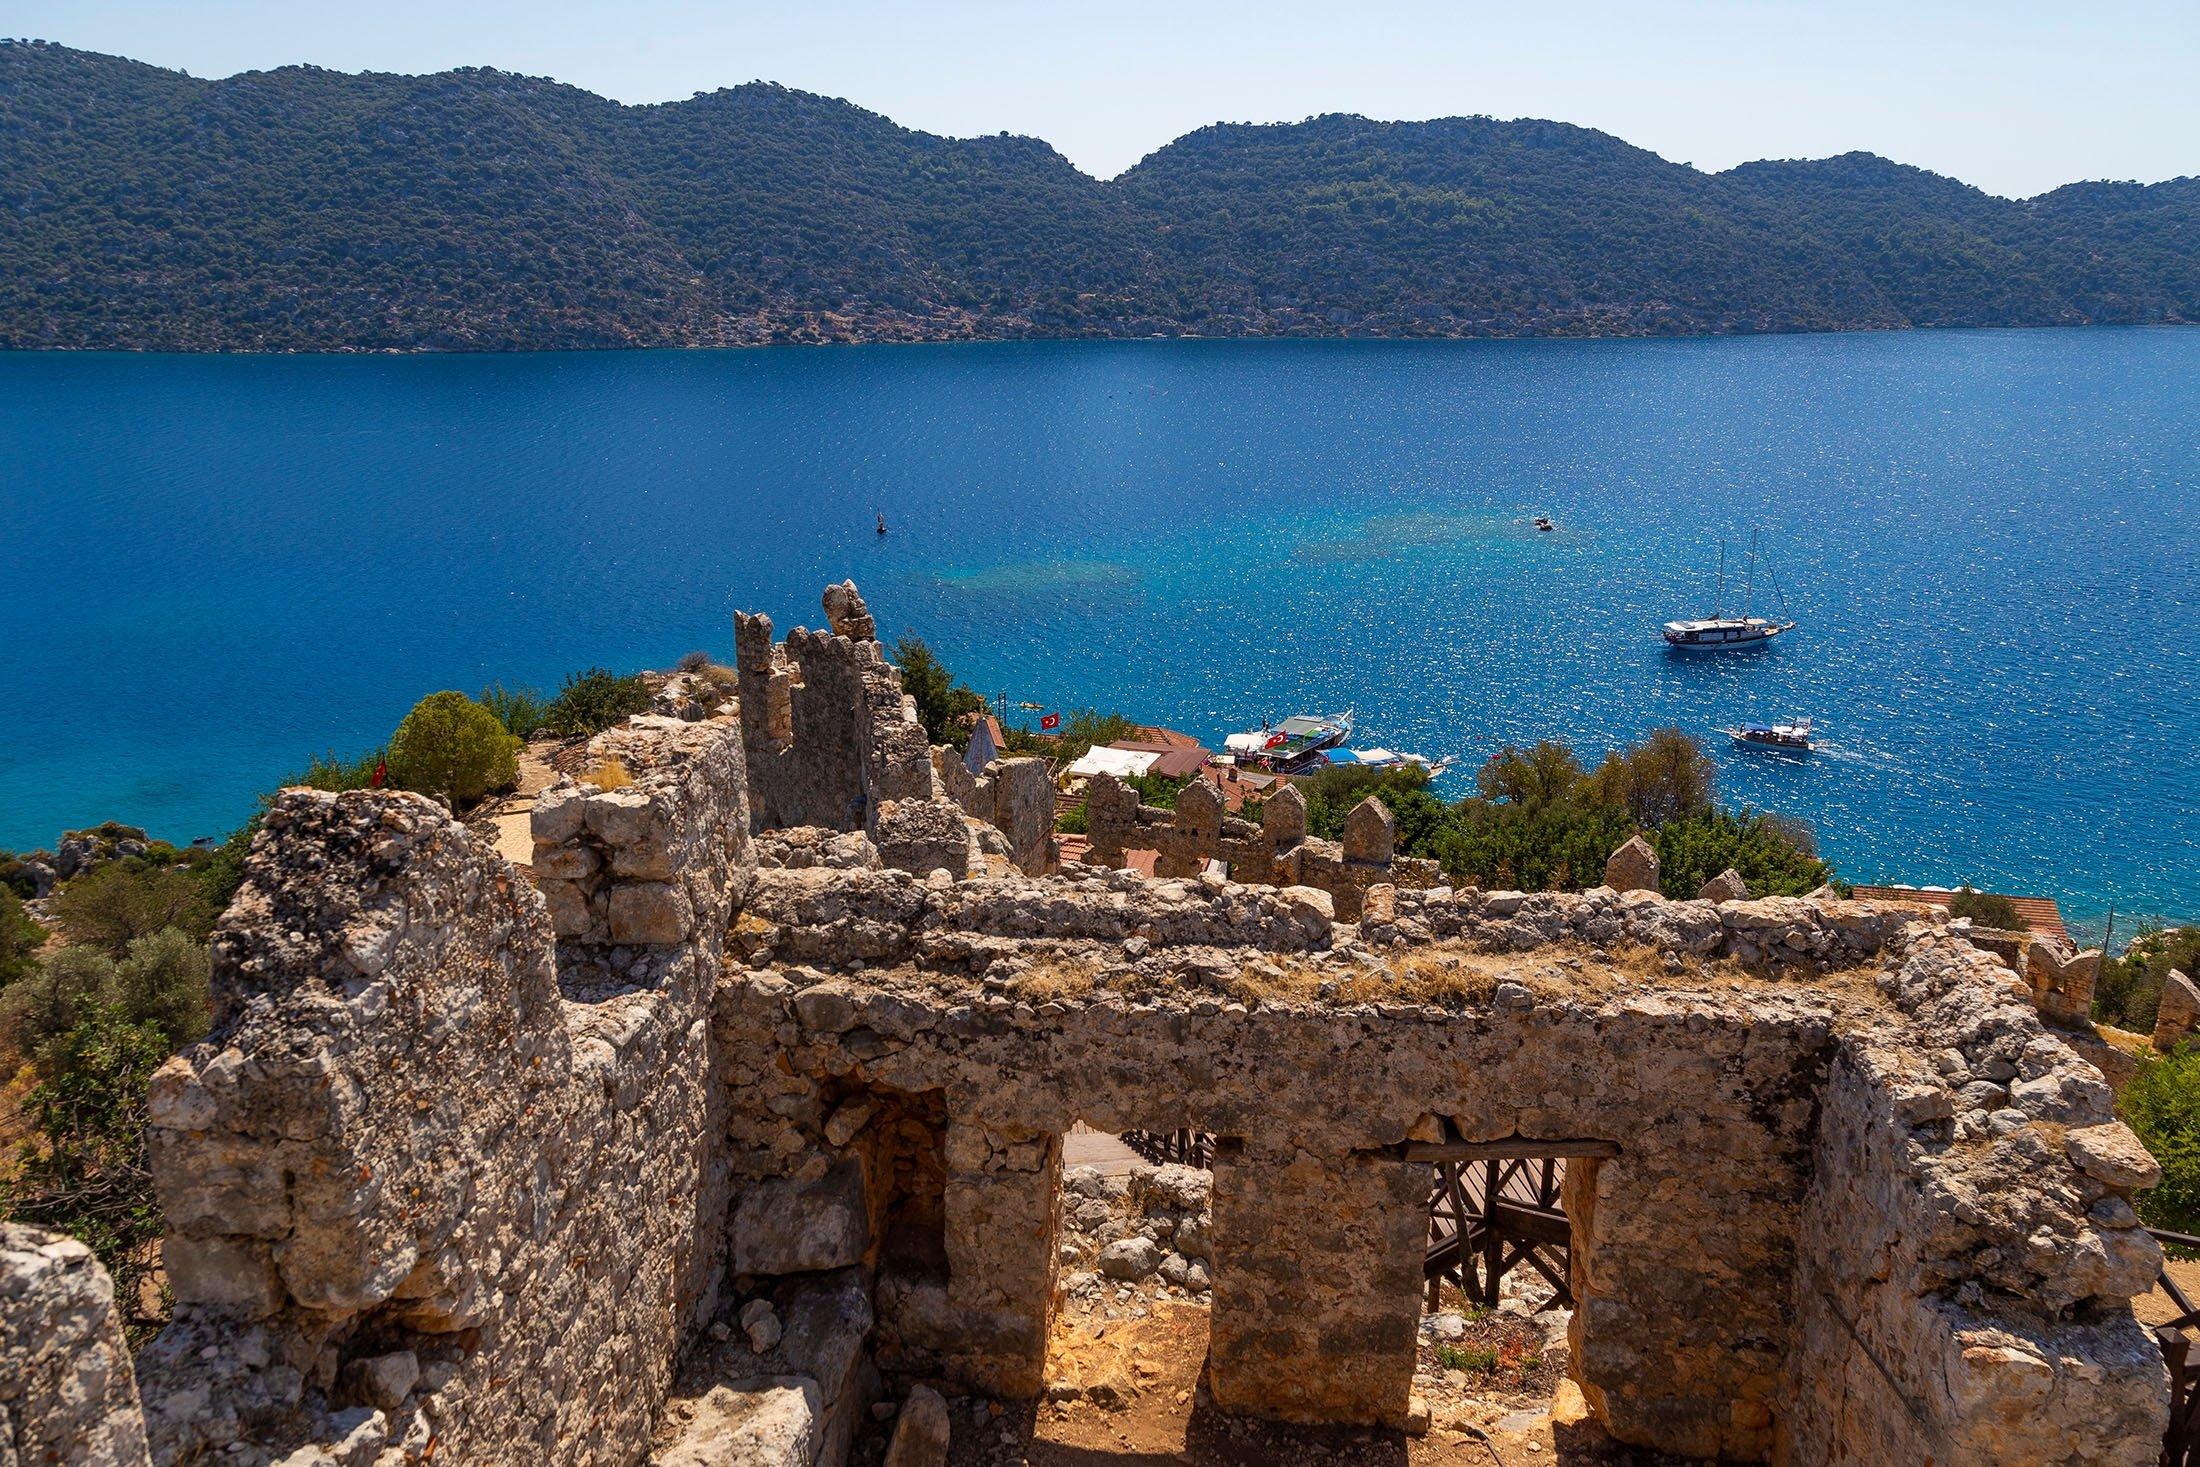 The Island of Kaleköy. (Shutterstock Photo)